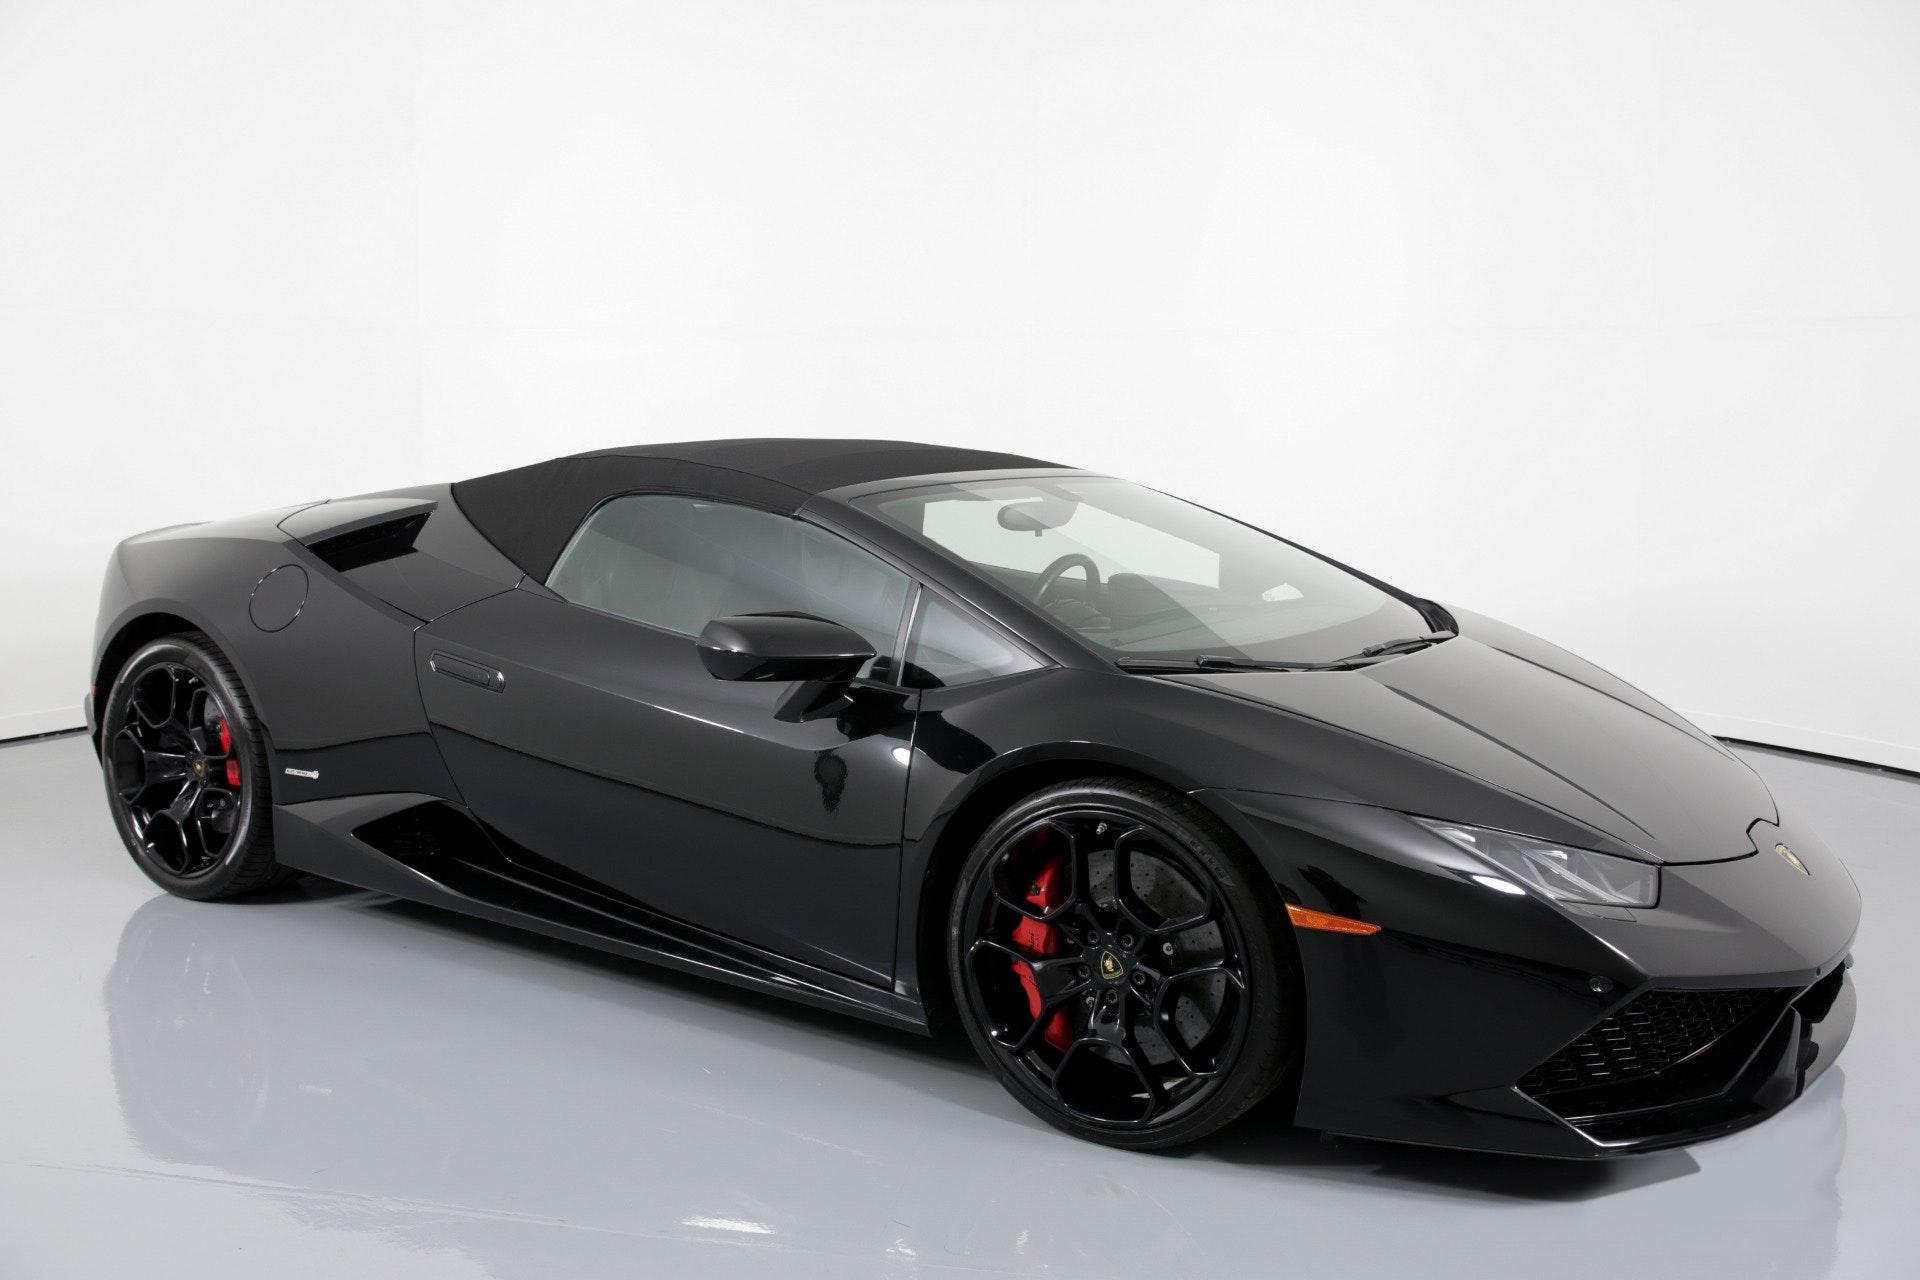 Miami 2017 Lamborghini Huracan image #3